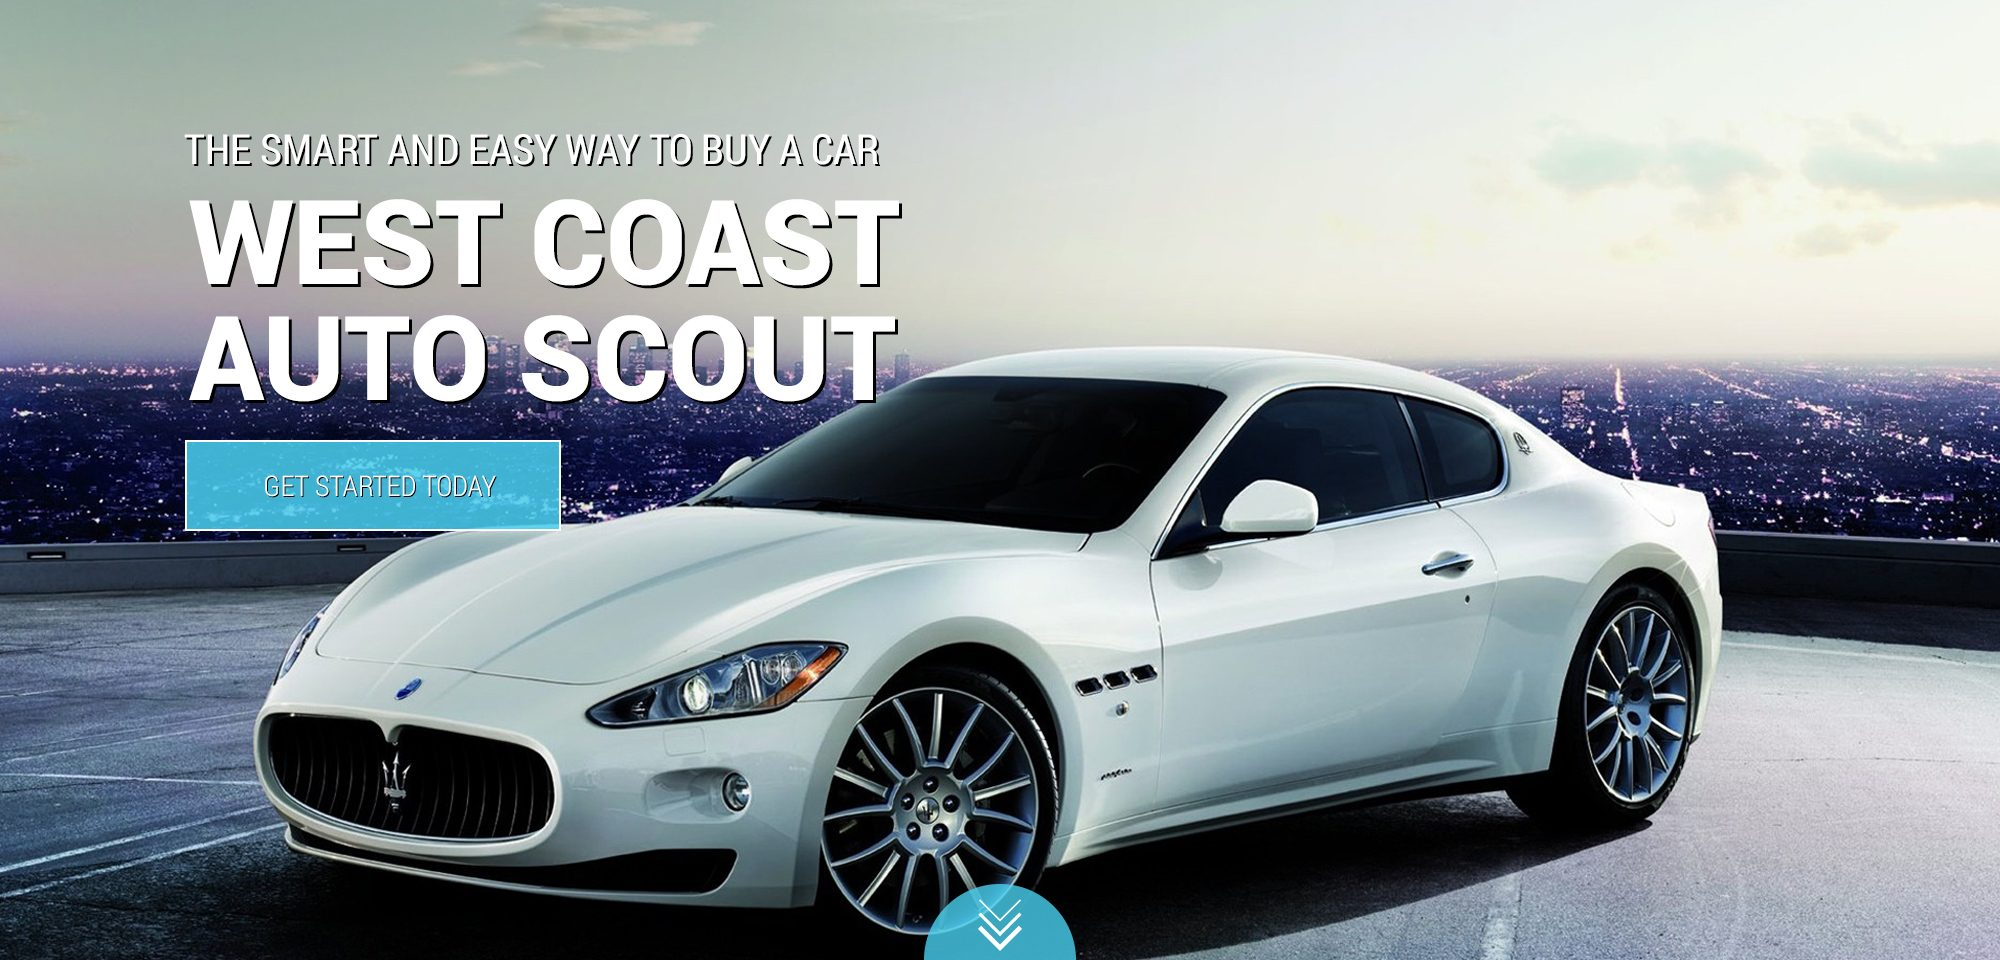 West Coast Auto Scout Los Angeles Expert Auto Brokers